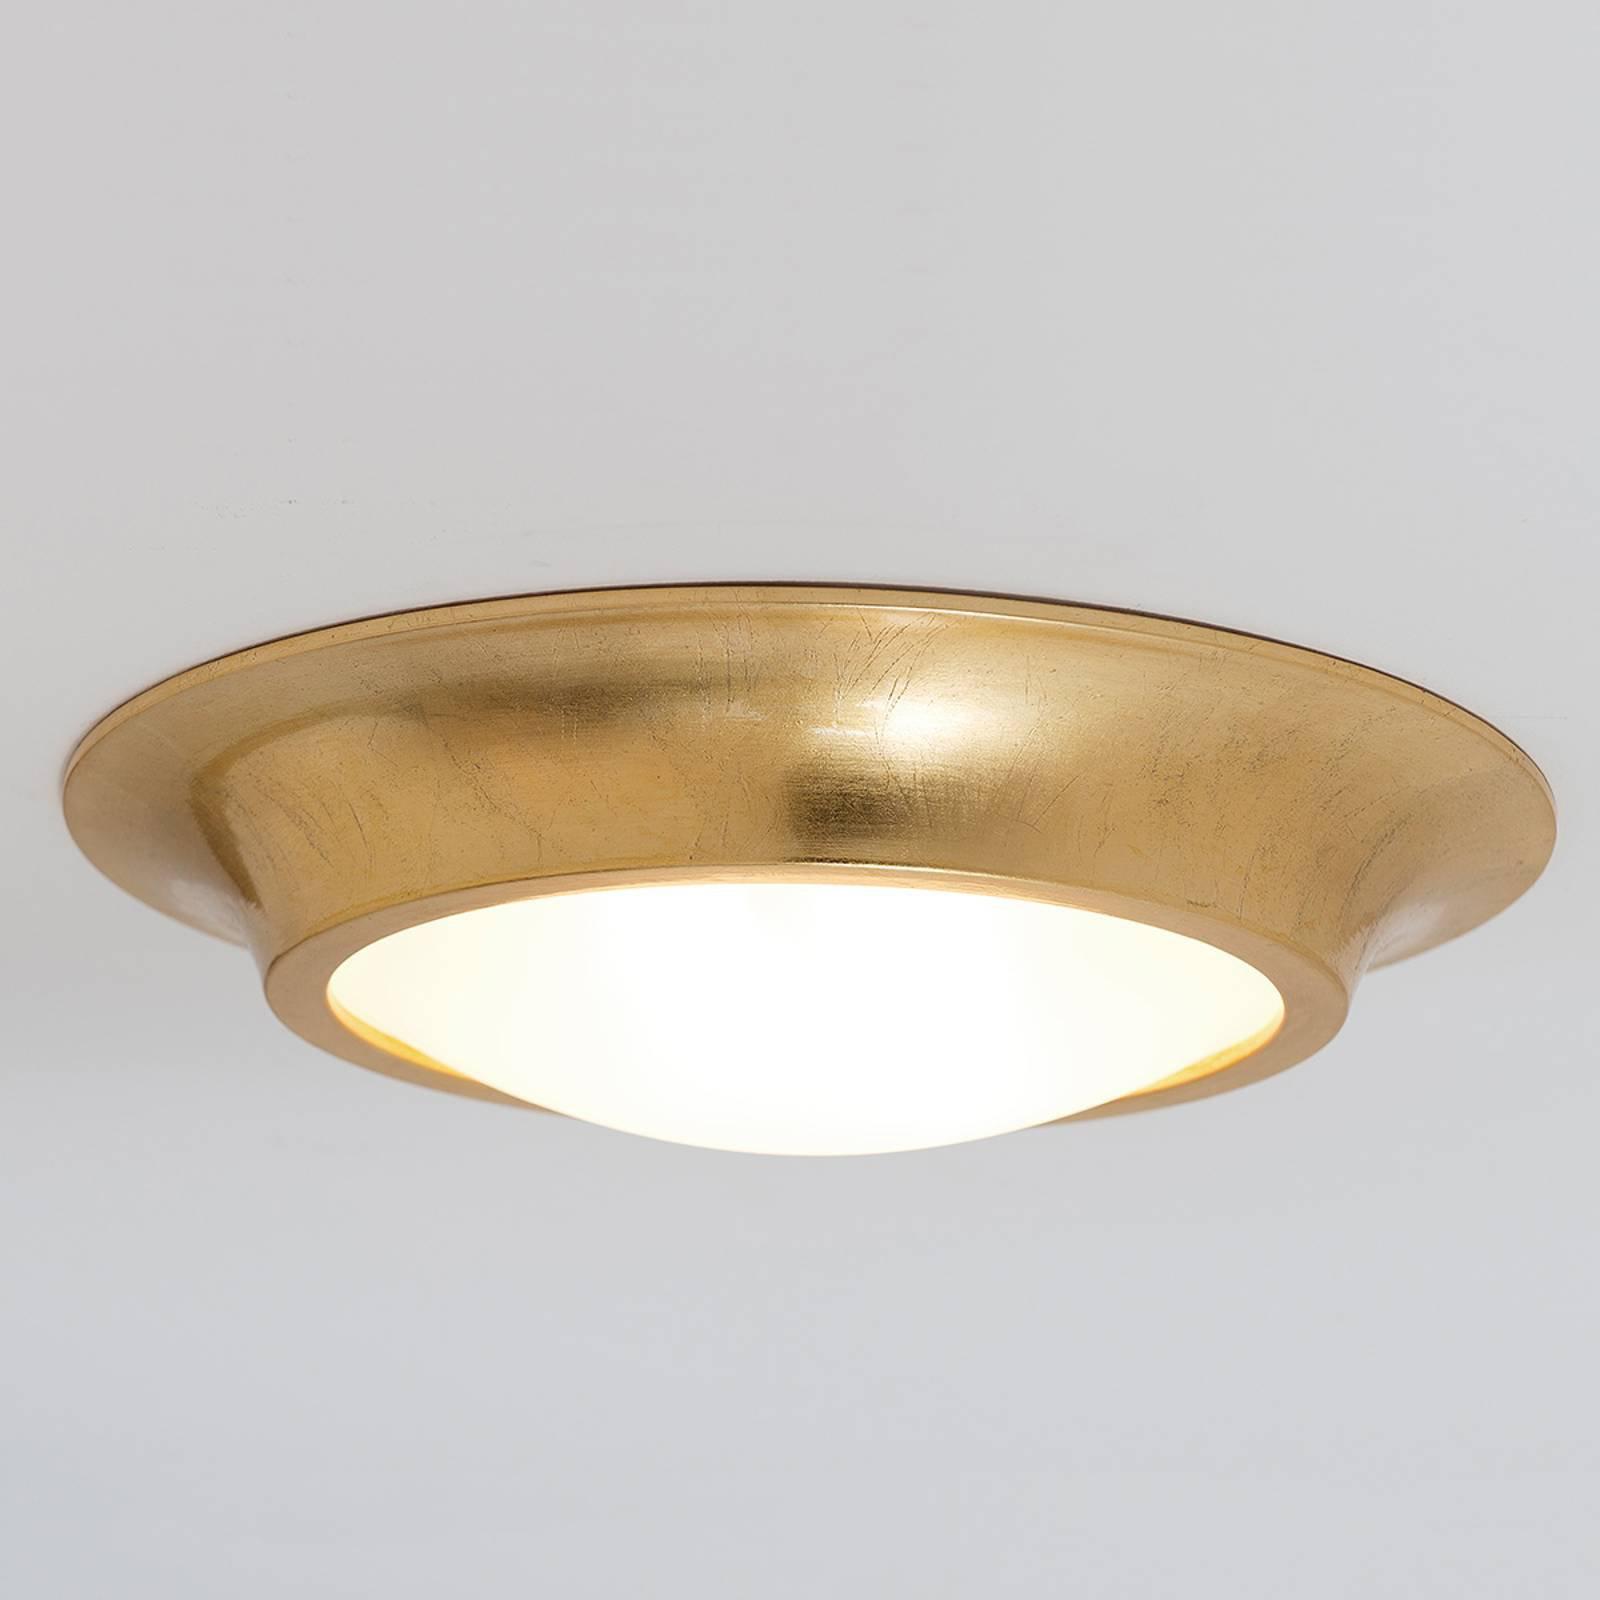 Gyllen keramikktaklampe Spettacolo